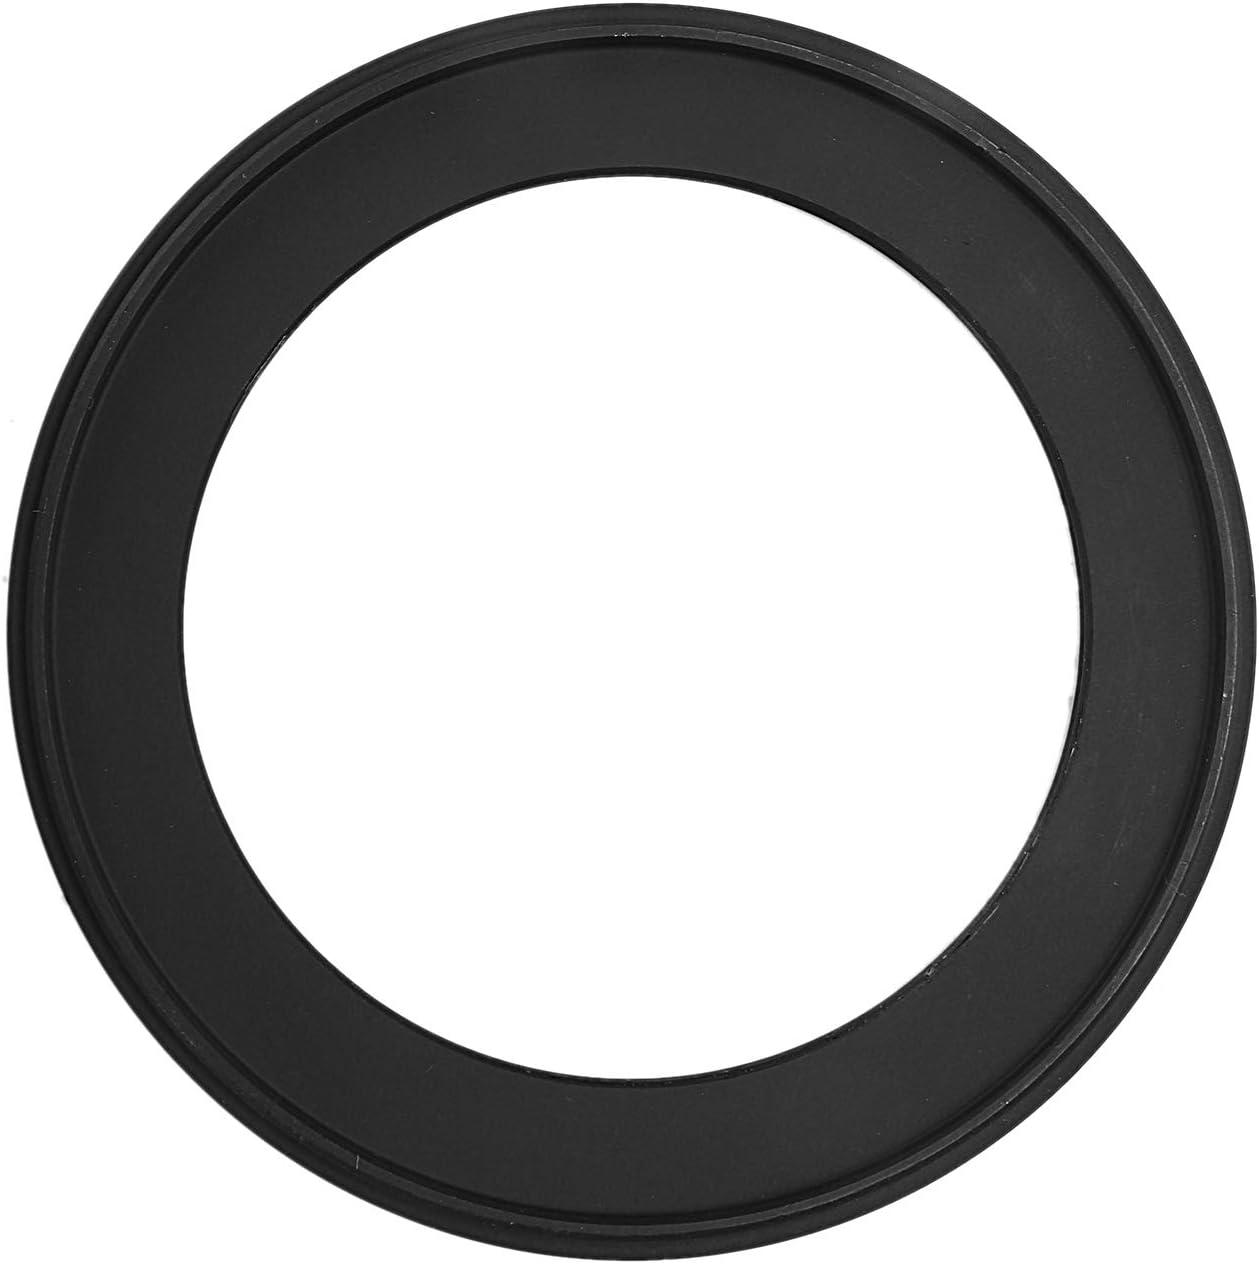 Moligh doll 77mm-58mm 77mm 58mm Black Step Down Ring for Camera